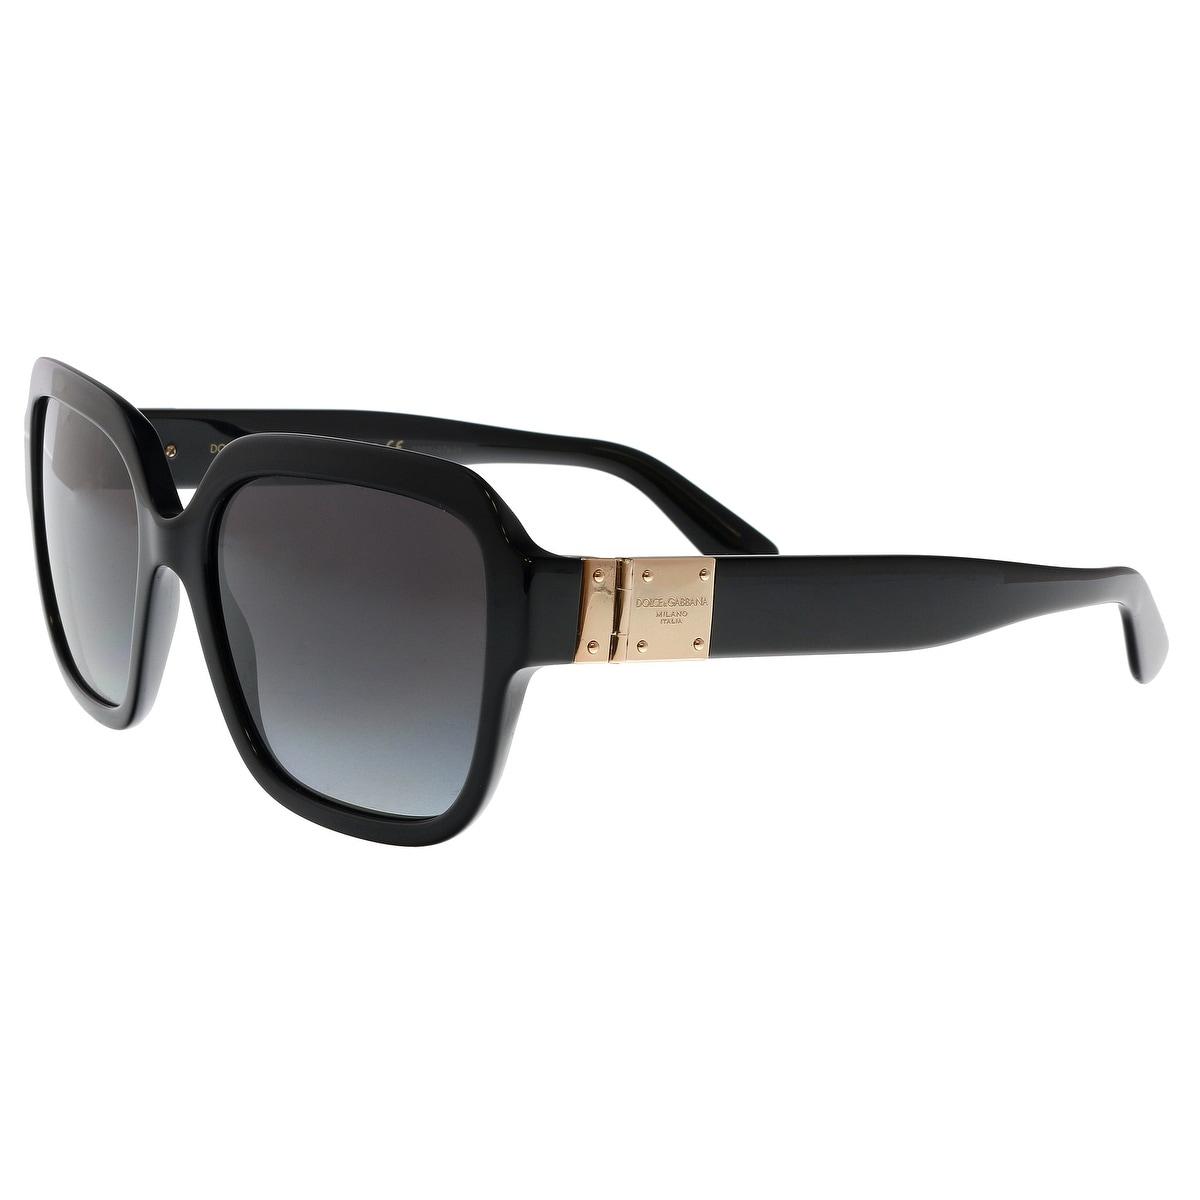 da6b43a20d35 Shop Dolce   Gabbana DG4336 501 8G Black Square Sunglasses - 56-18 ...